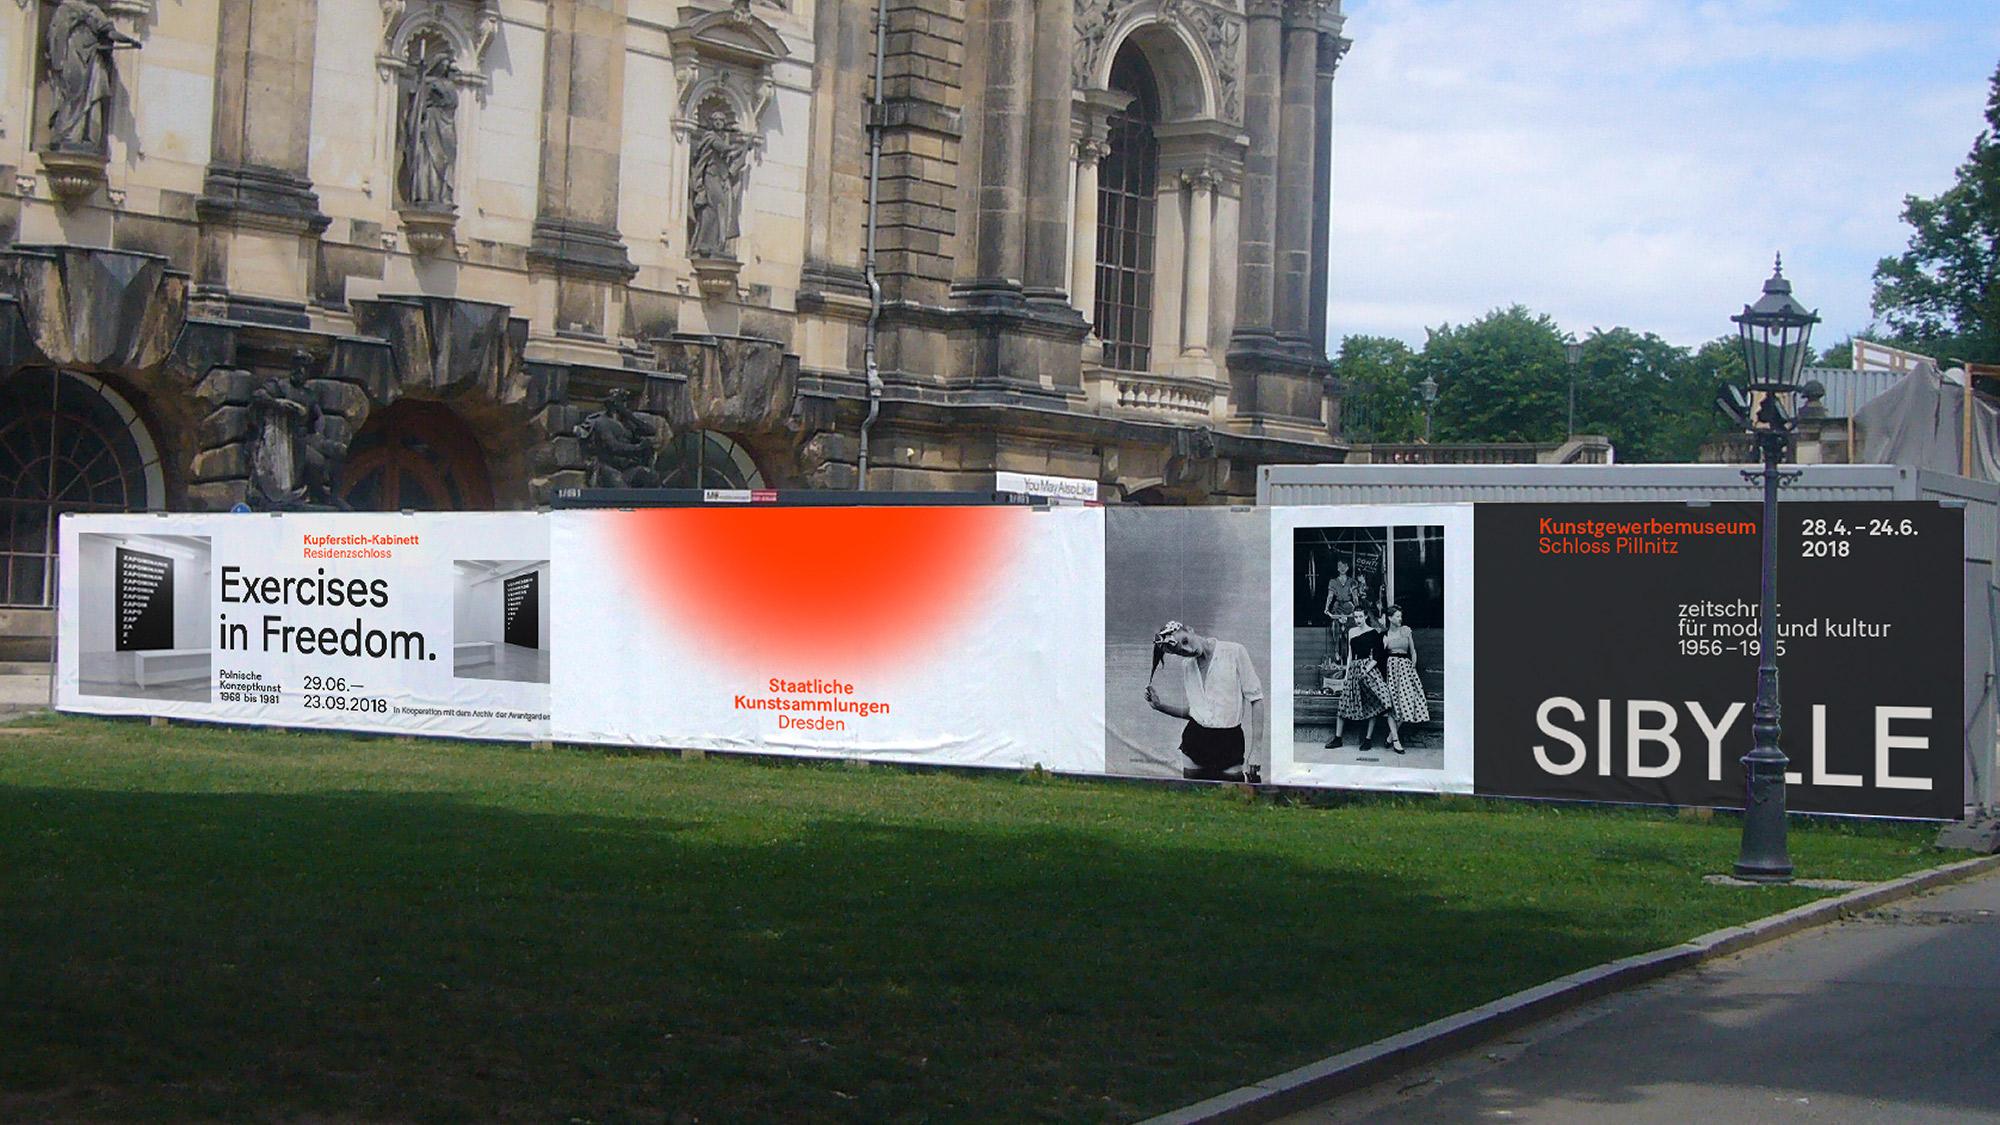 Staatliche Kunstsammlungen Dresden – Corporate Design